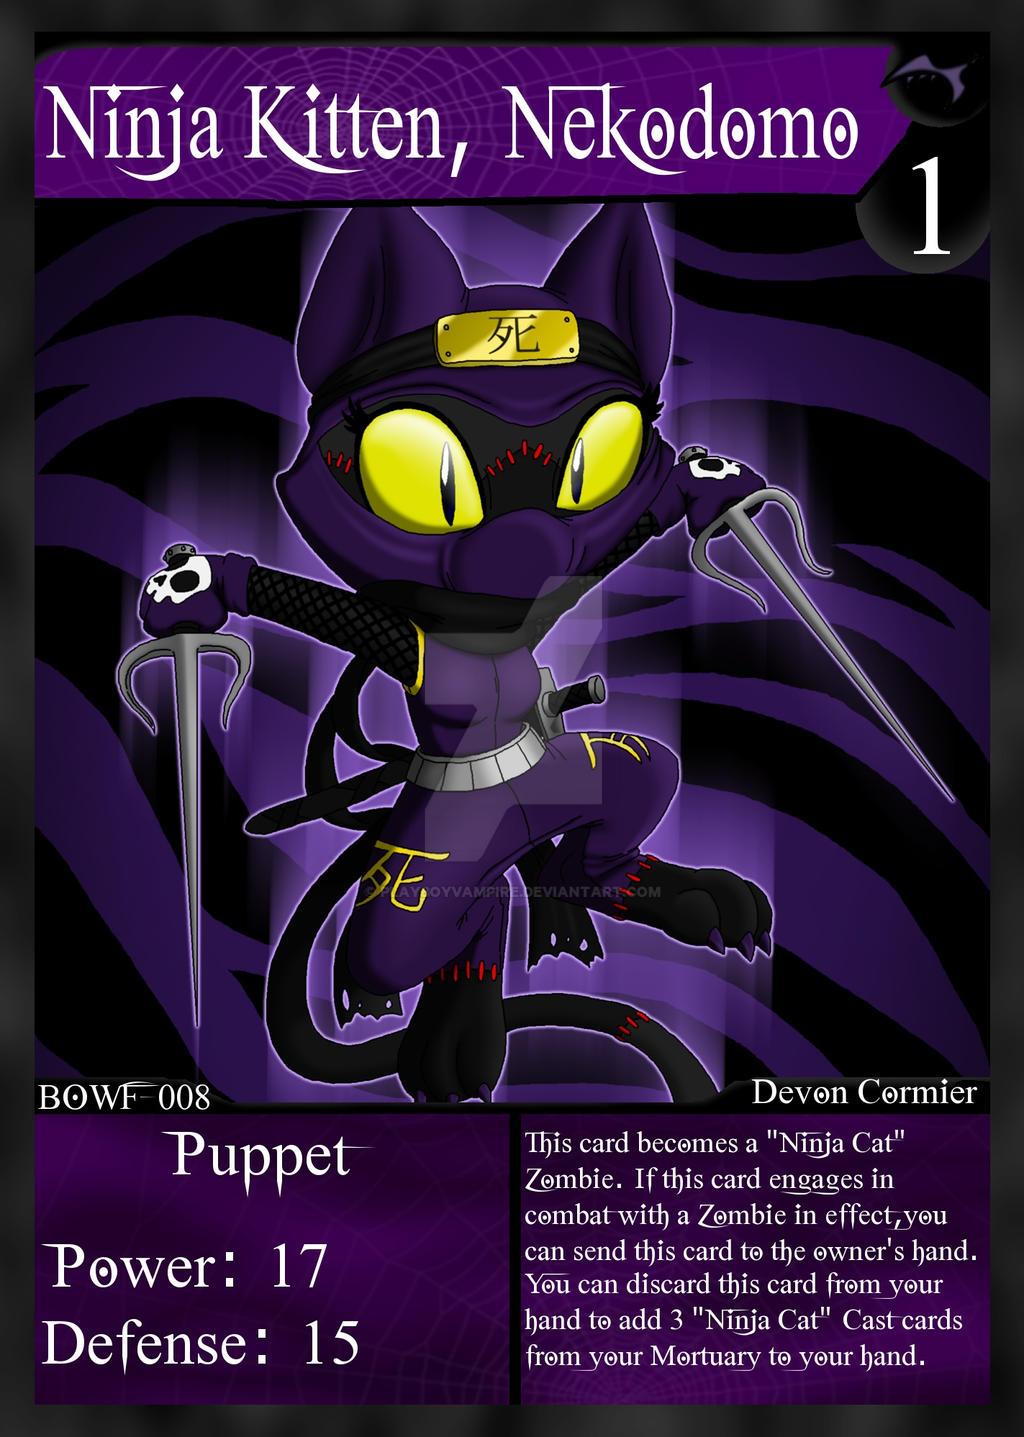 NecroMasters - BOWF - 008 - Ninja Kitten, Nekodomo by PlayboyVampire